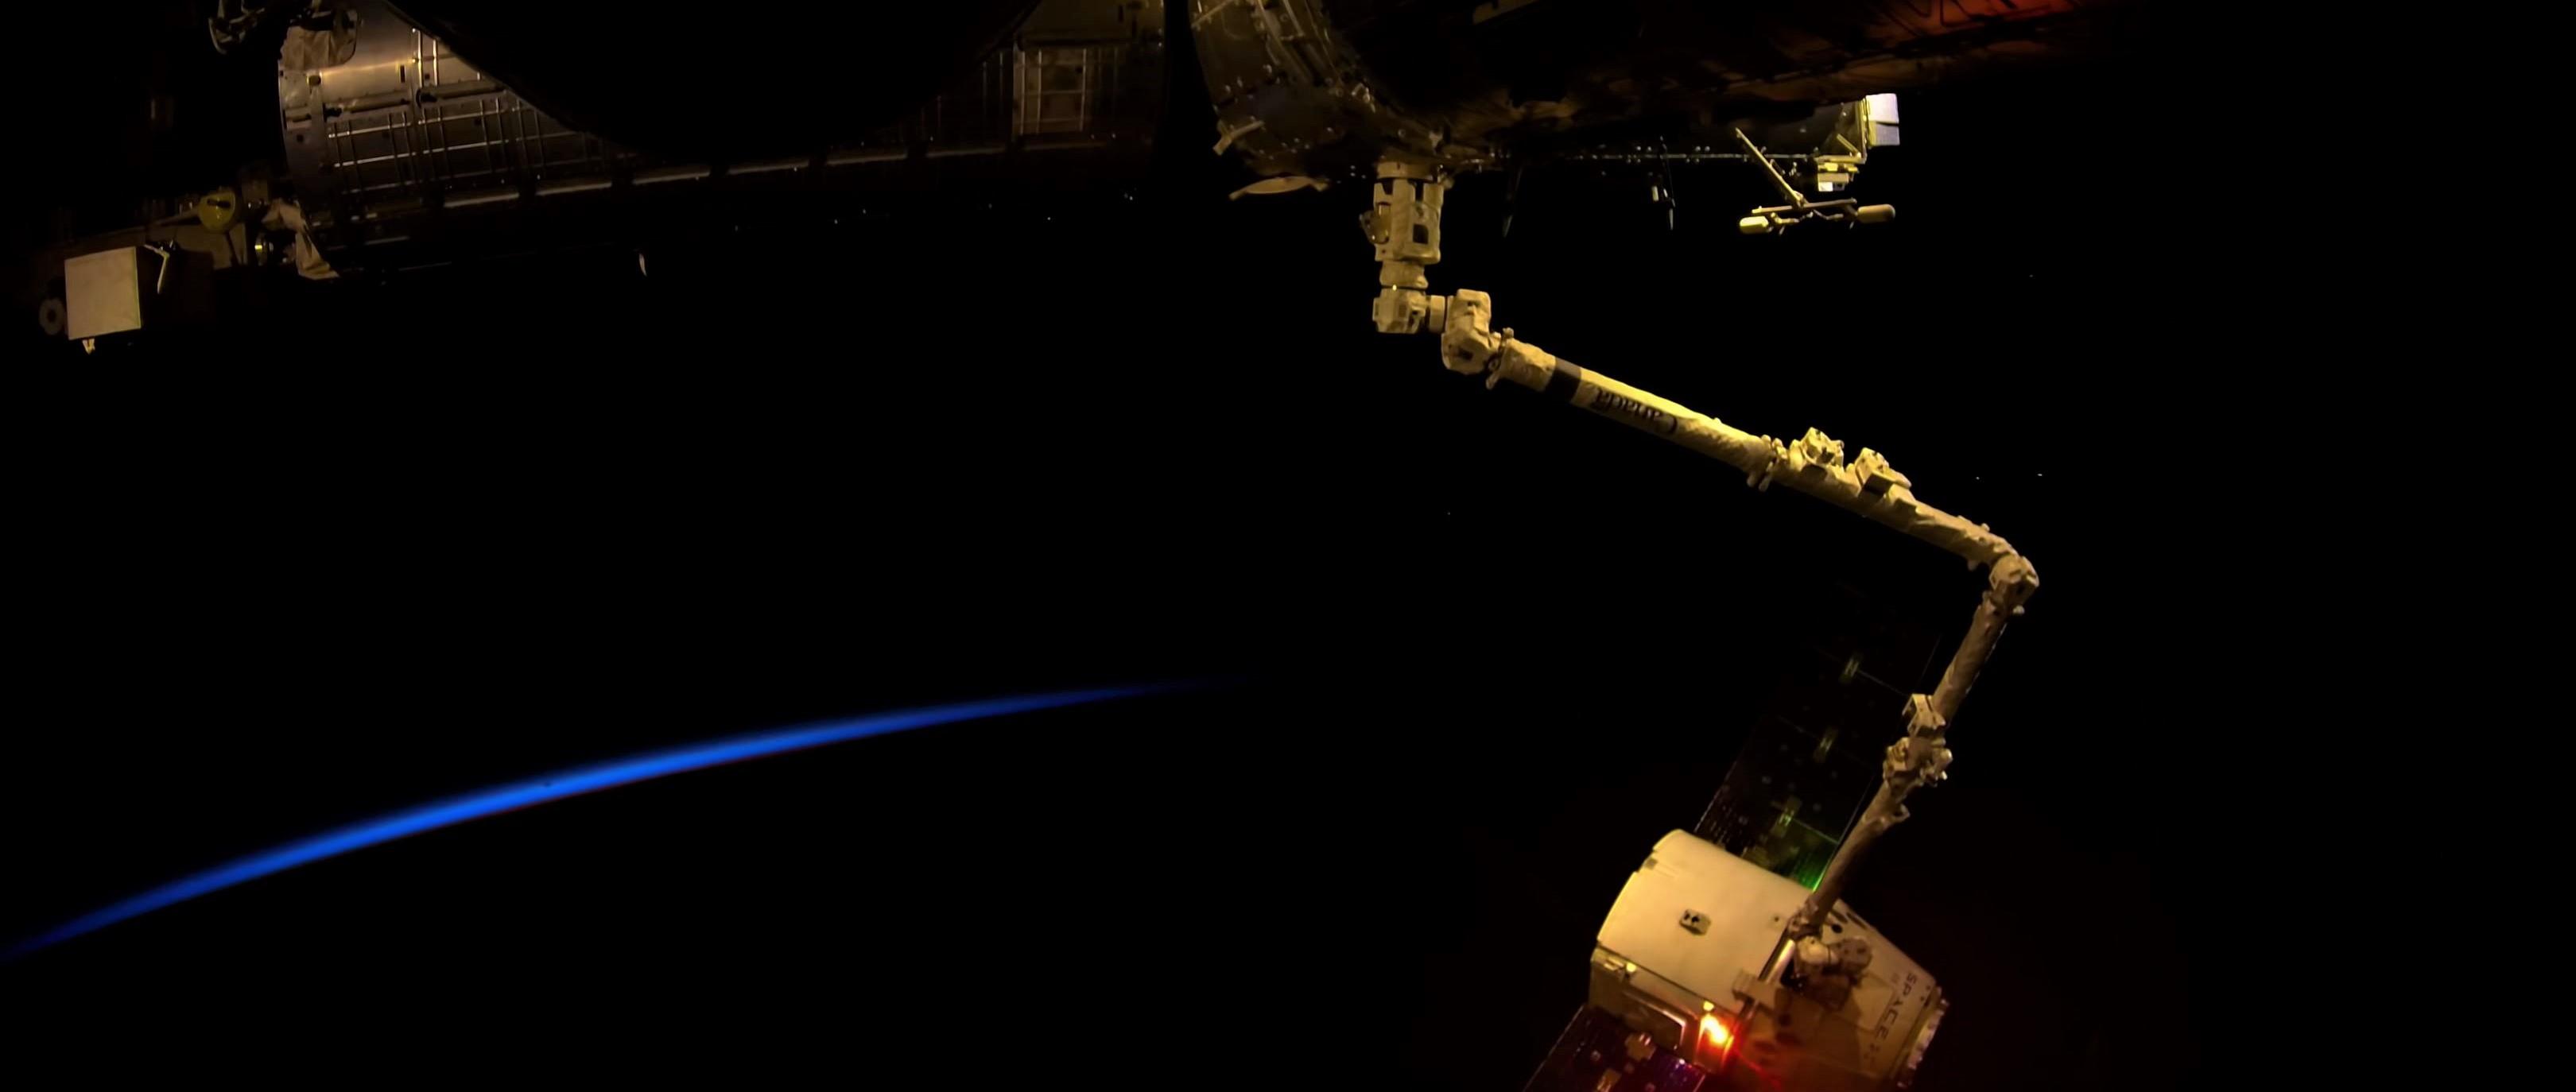 CRS-15 departure 4K (ESA) 6